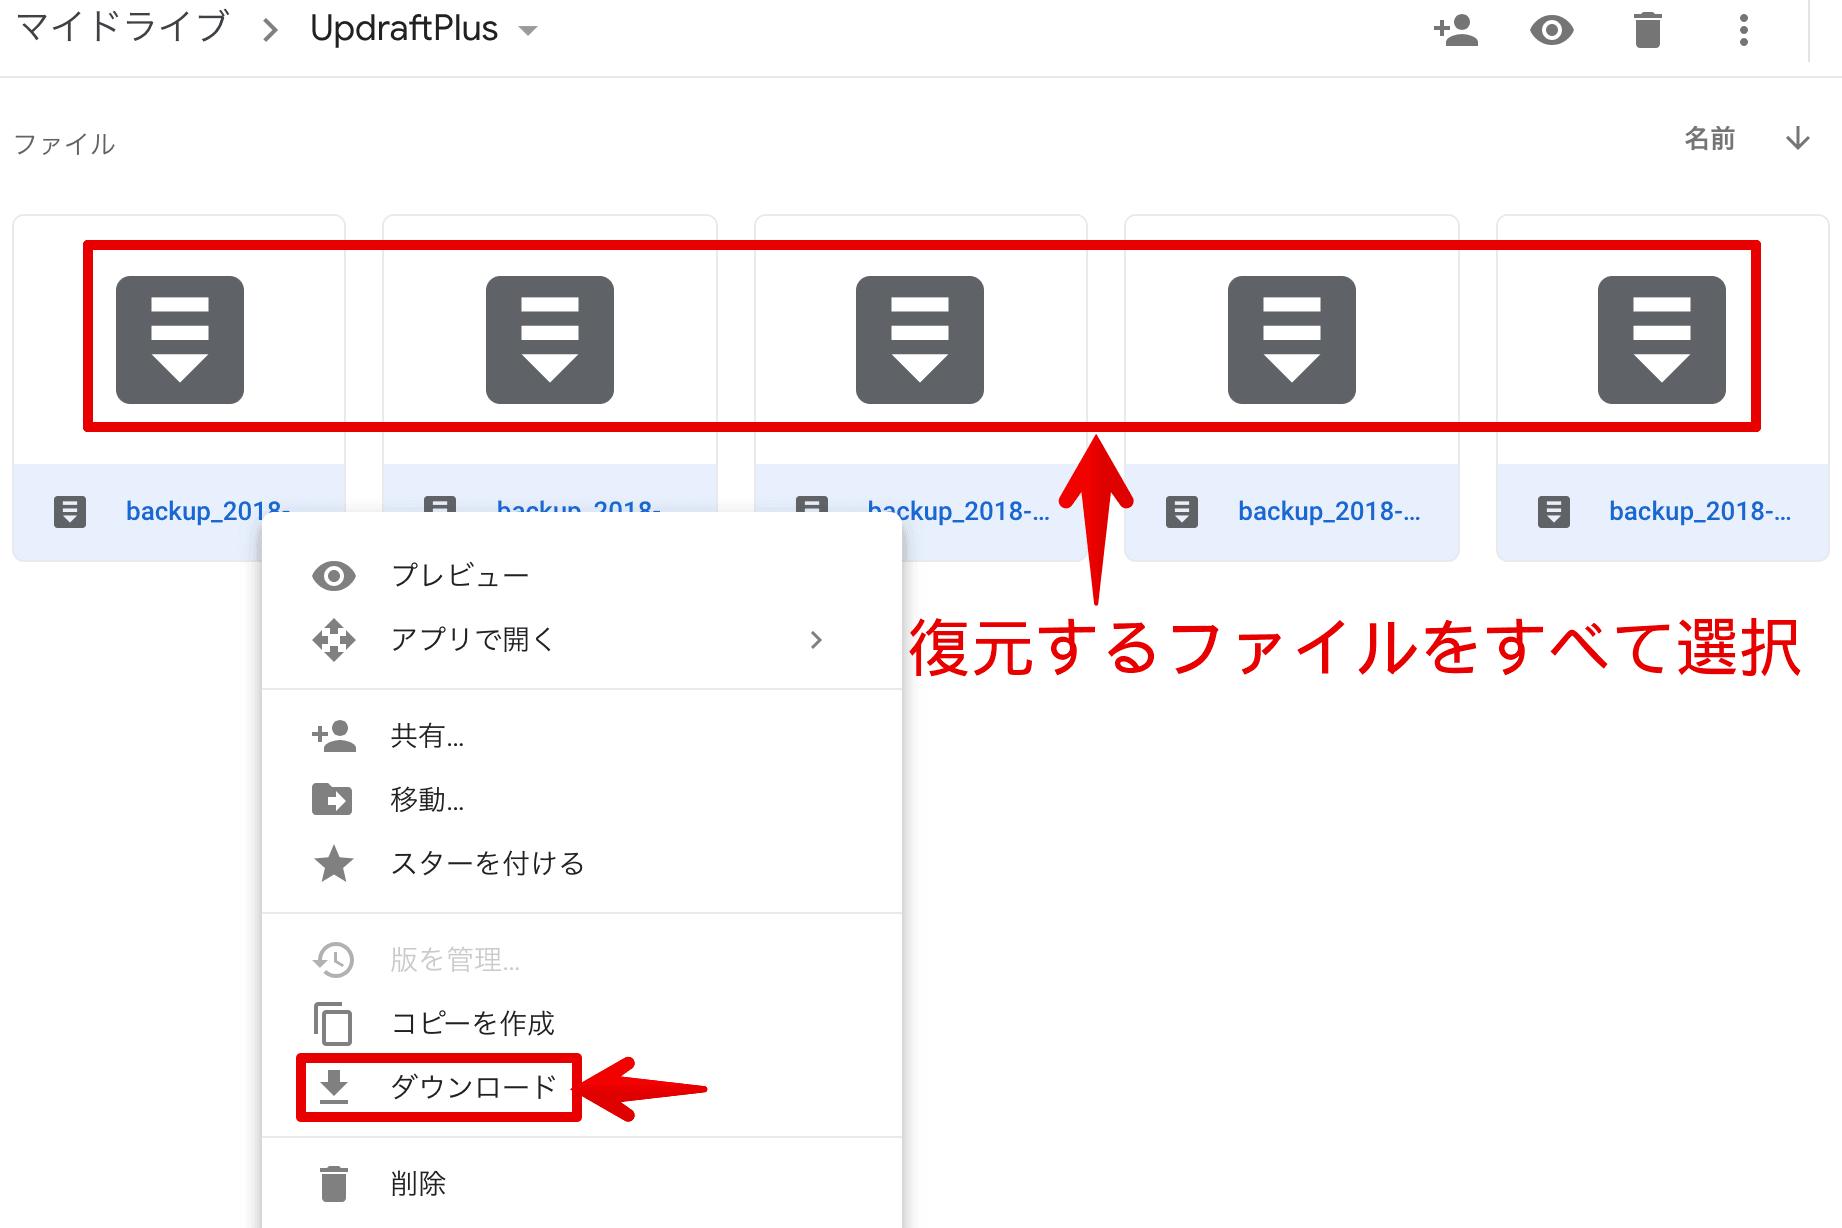 Googleドライブ-UpdraftPlusファイルダウンロード